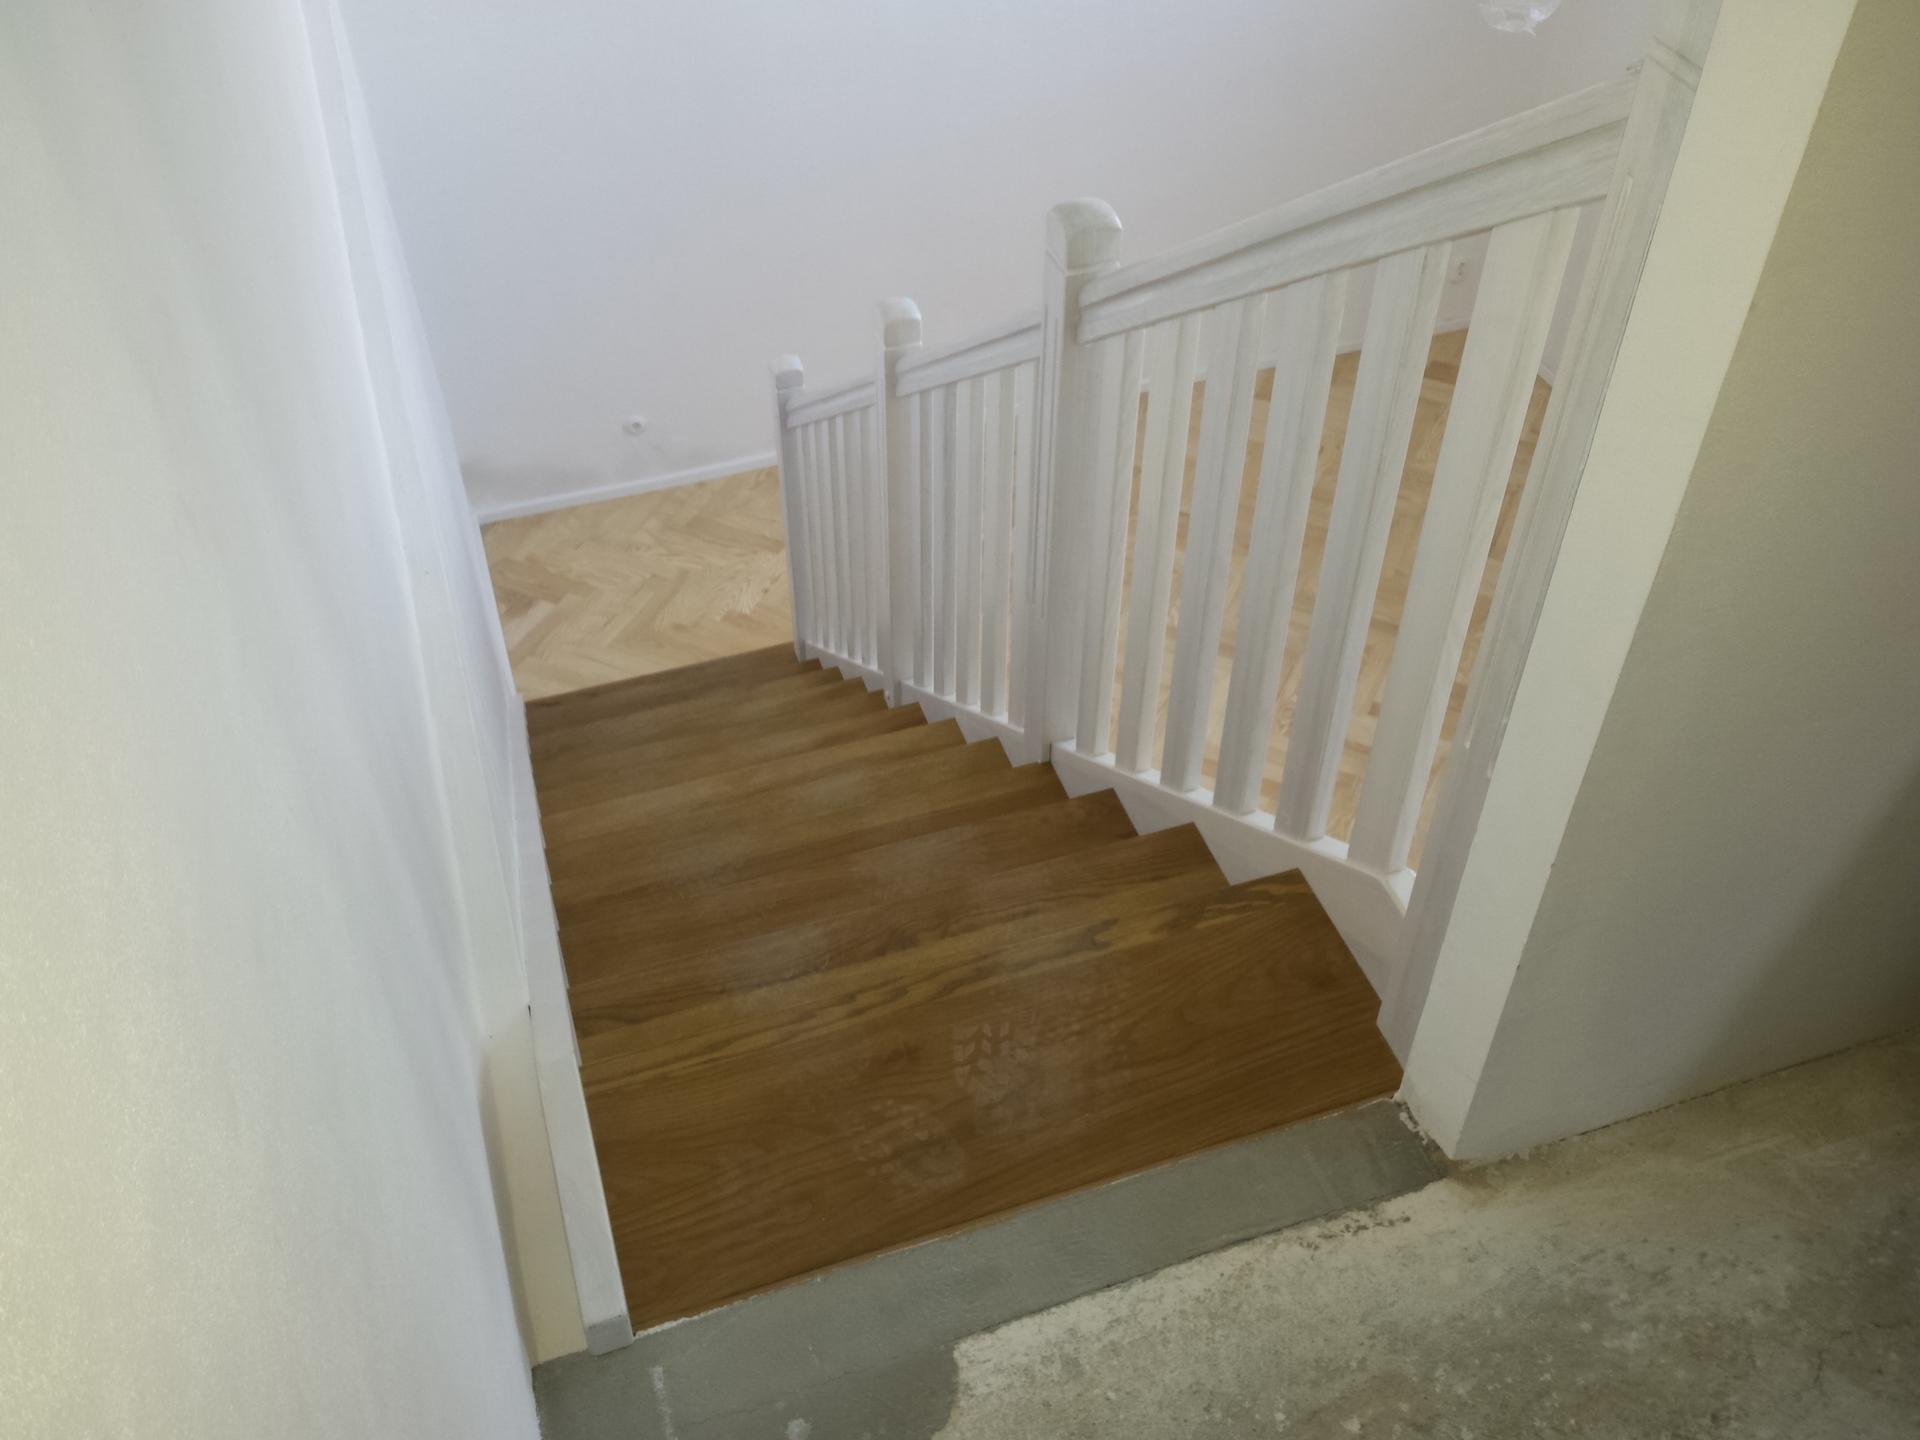 Rovnoramenné schodiště na zakázku Brno - 3